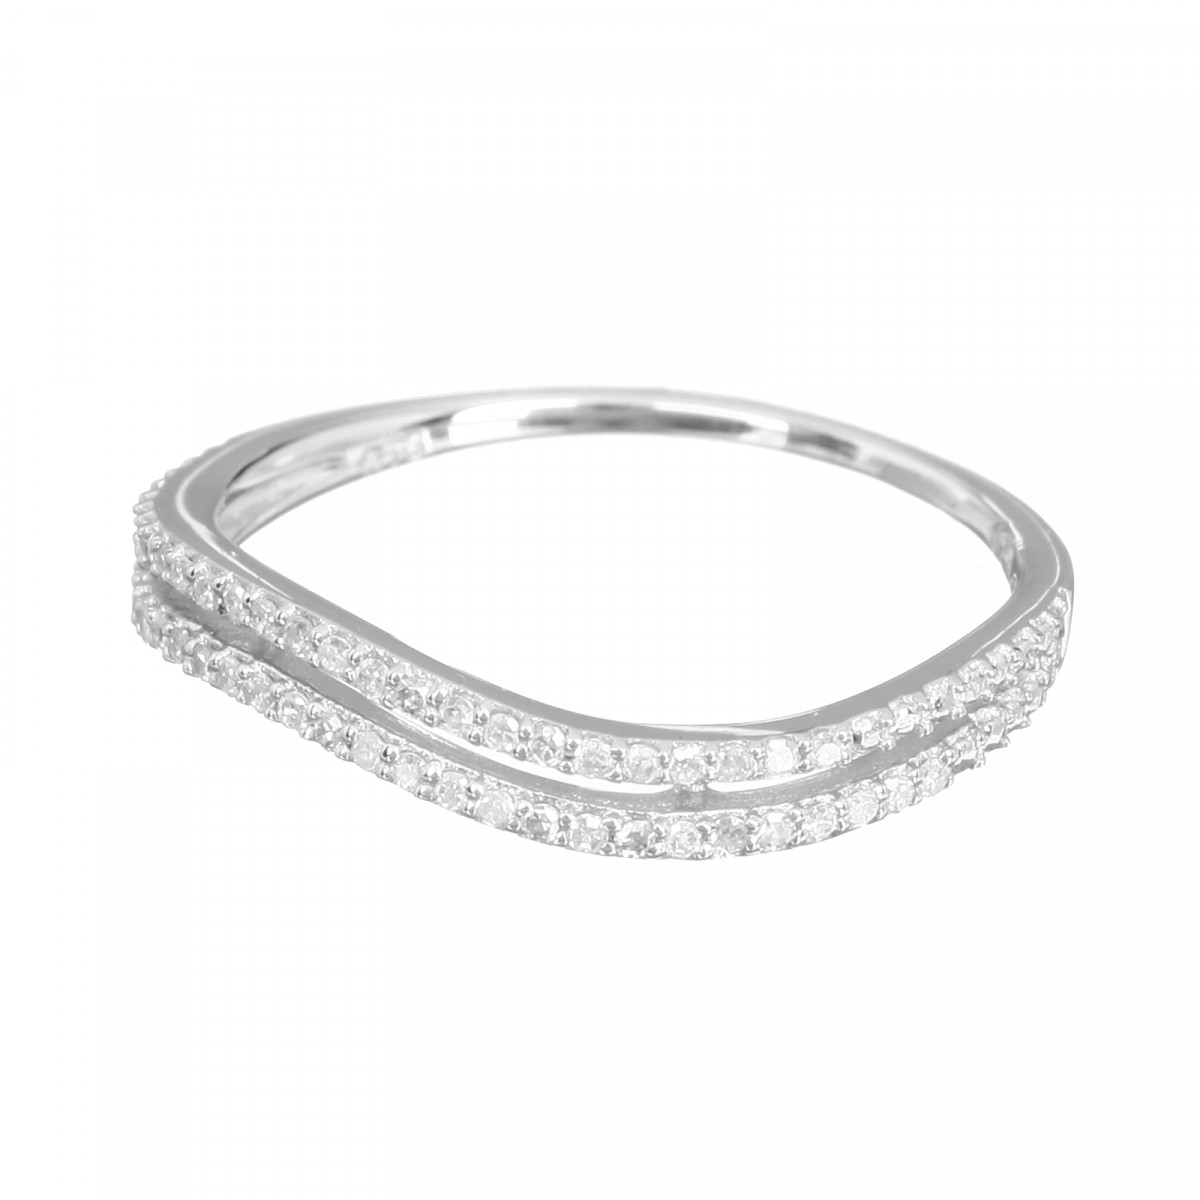 "Bague Or Blanc 375 ""ONDES LUMINEUSES"" Diamants 0,21 carat"